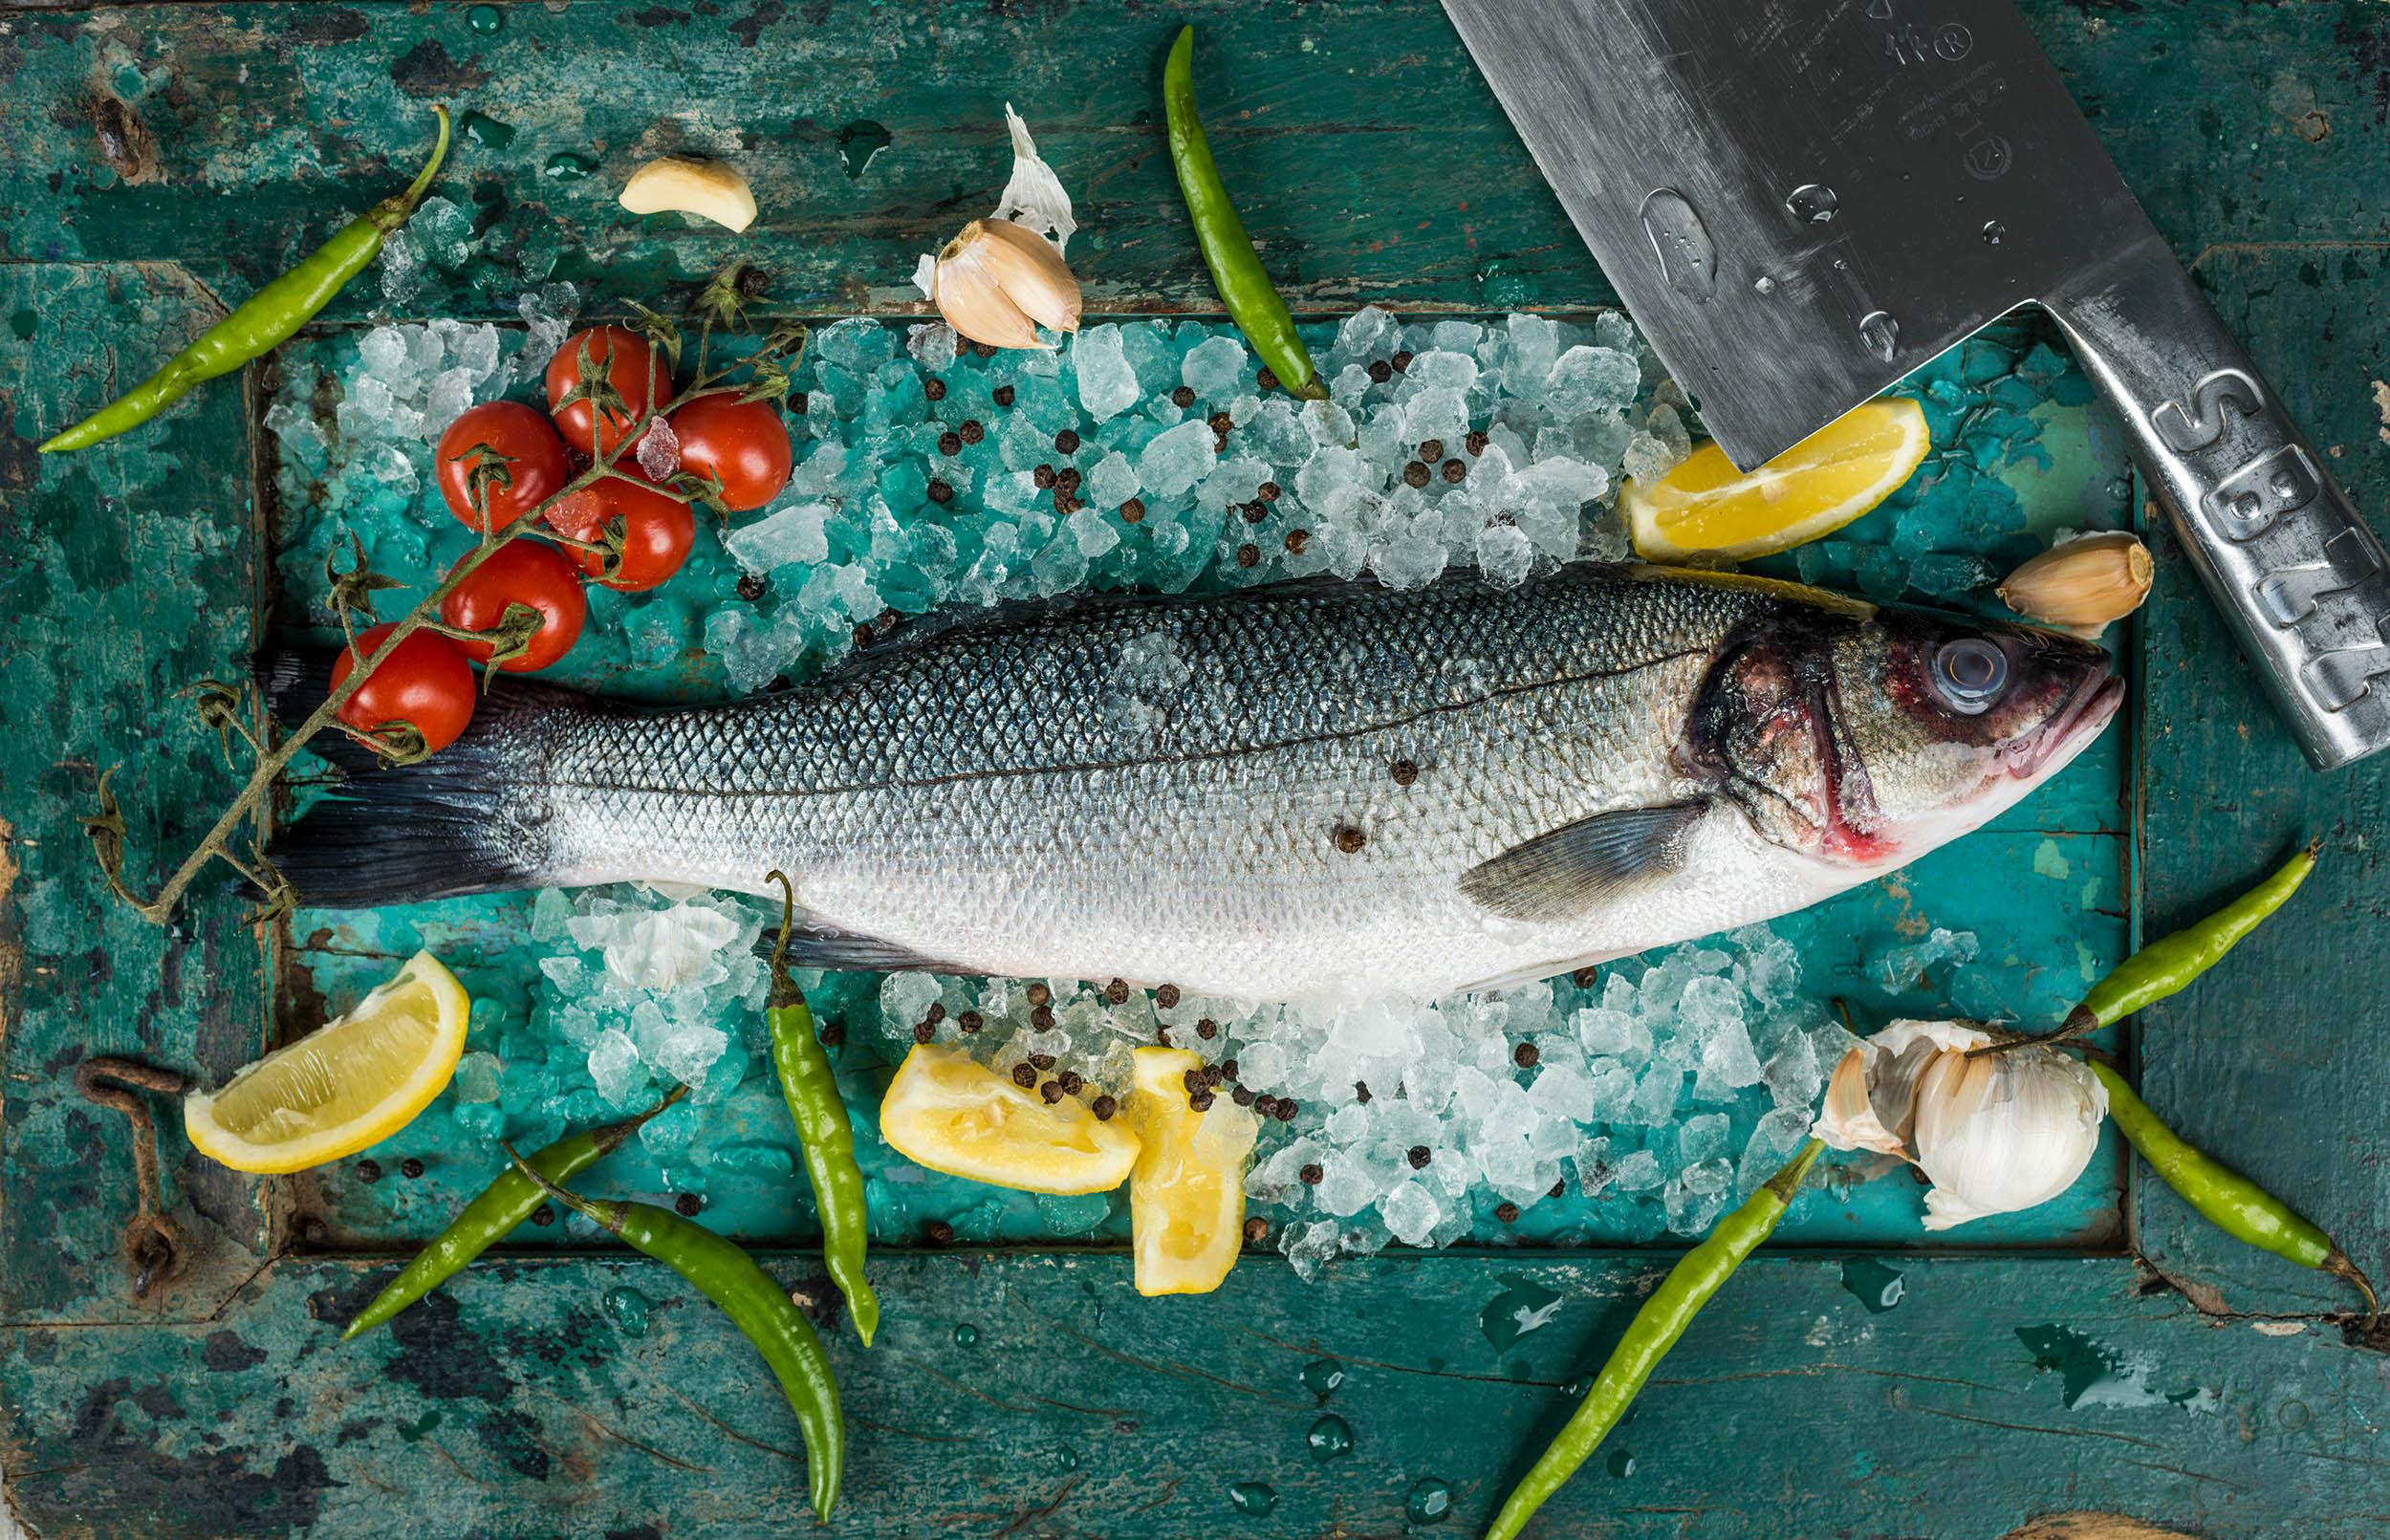 Seafoodmarket-8049.jpg